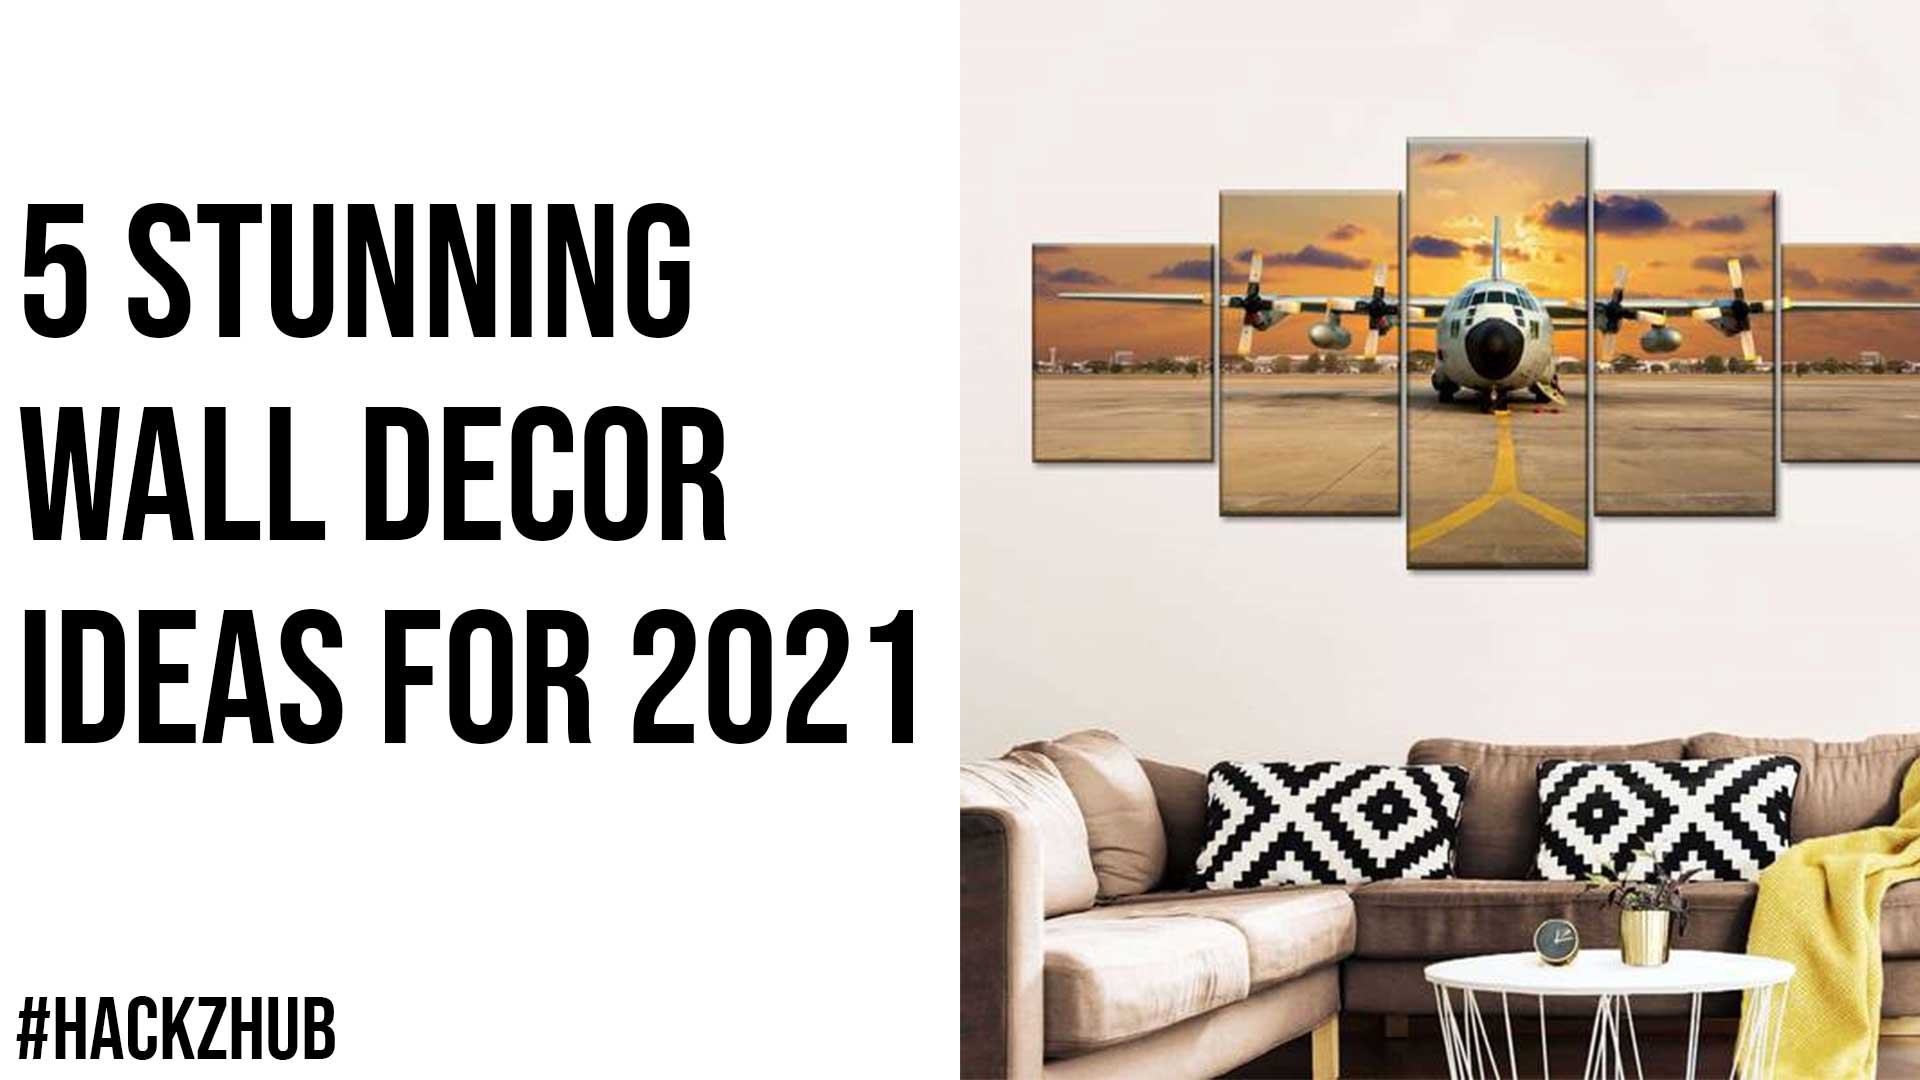 5 Stunning Wall Decor Ideas for 2021